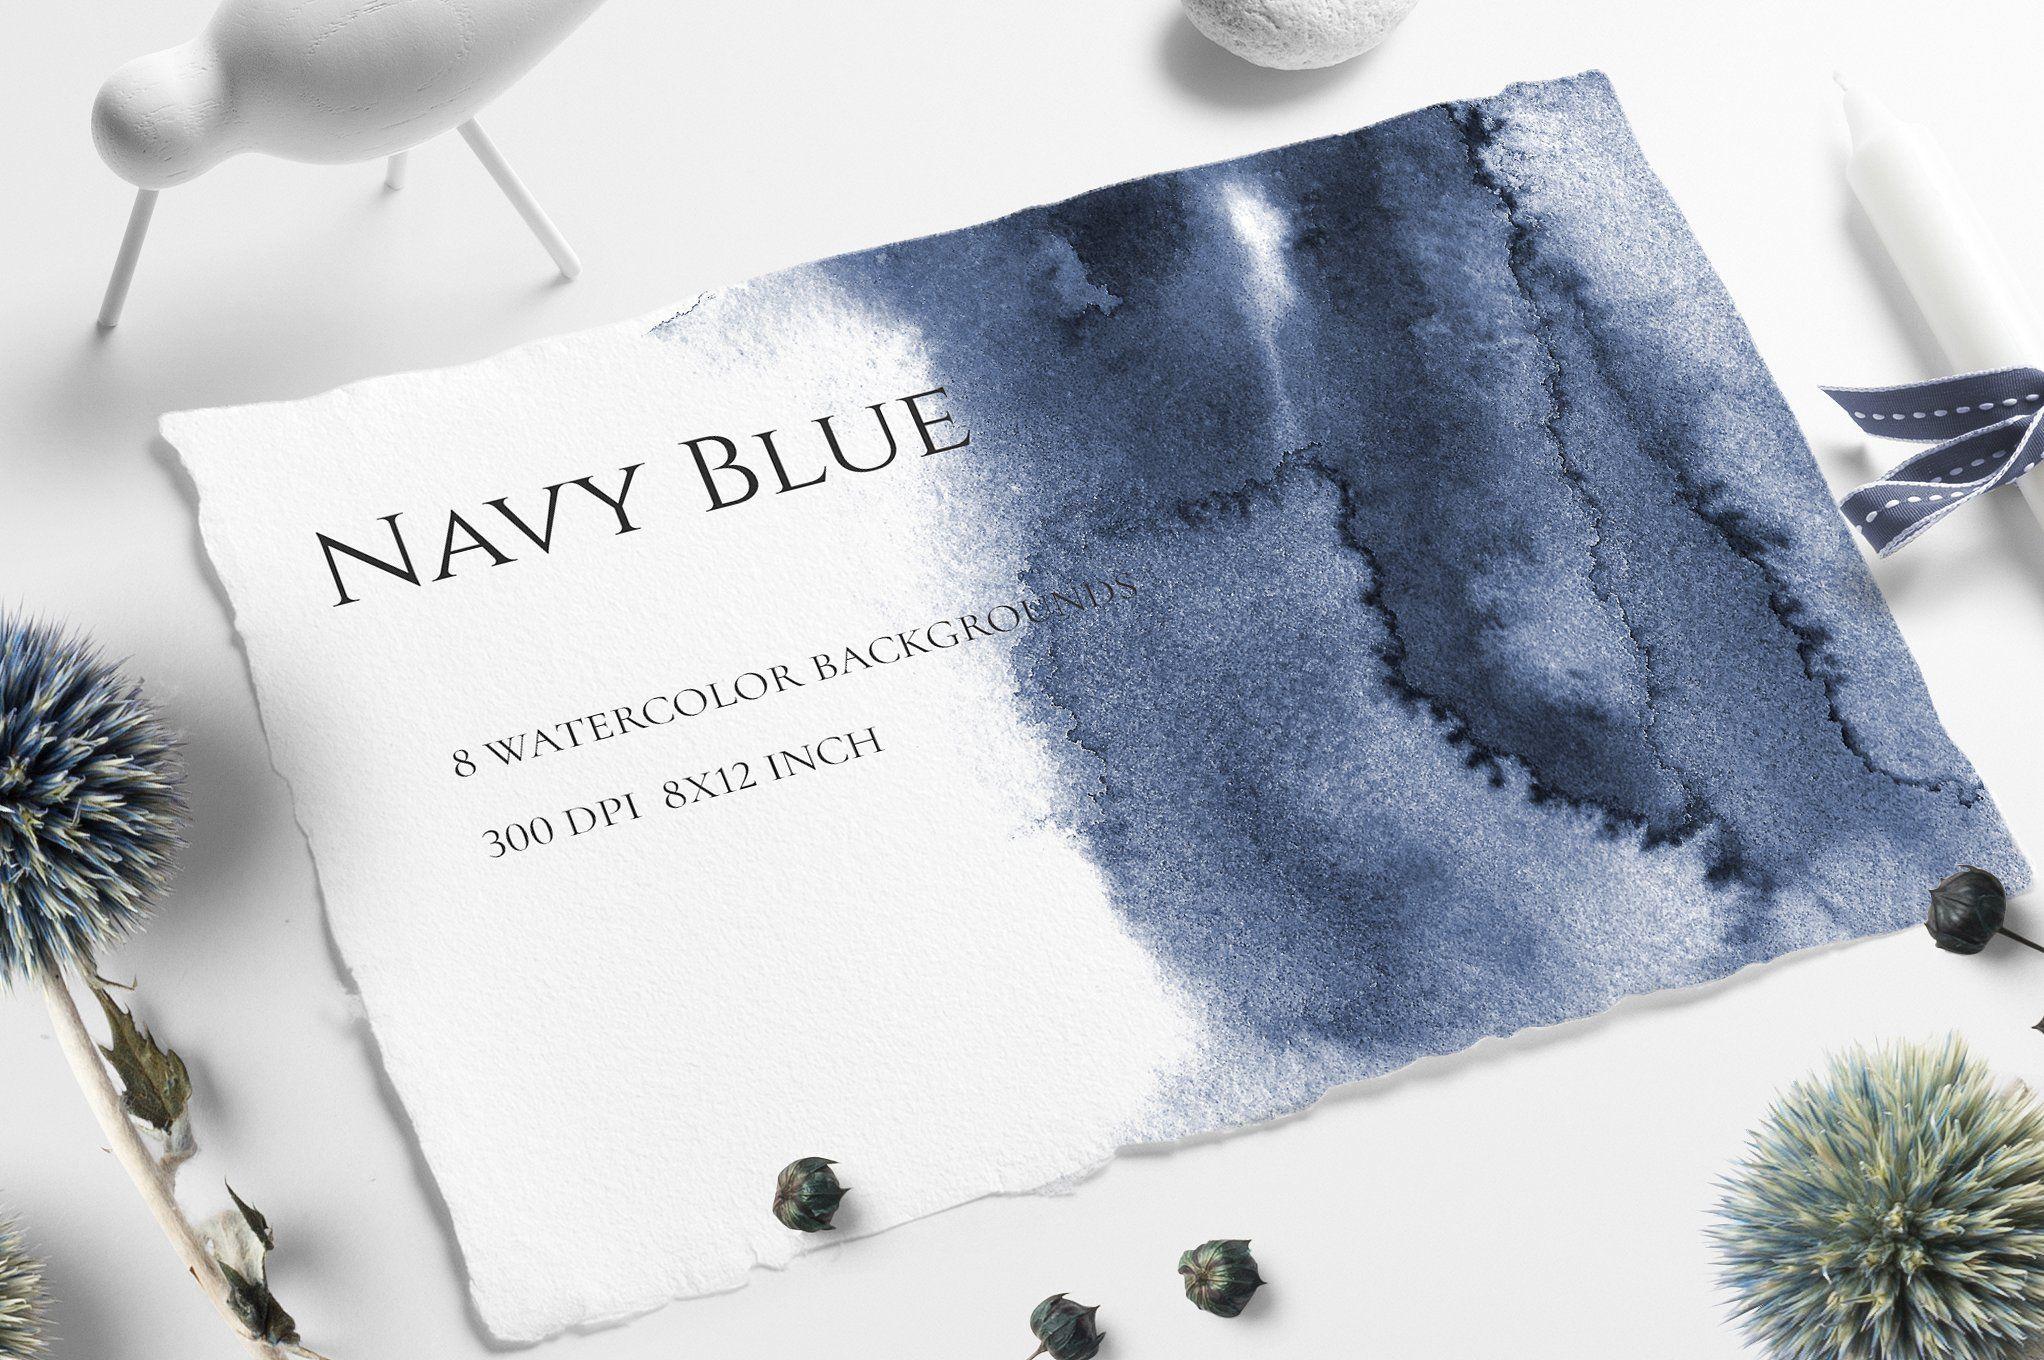 Navy Blue Ombre by CatherineWheel on creativemarket NAVY